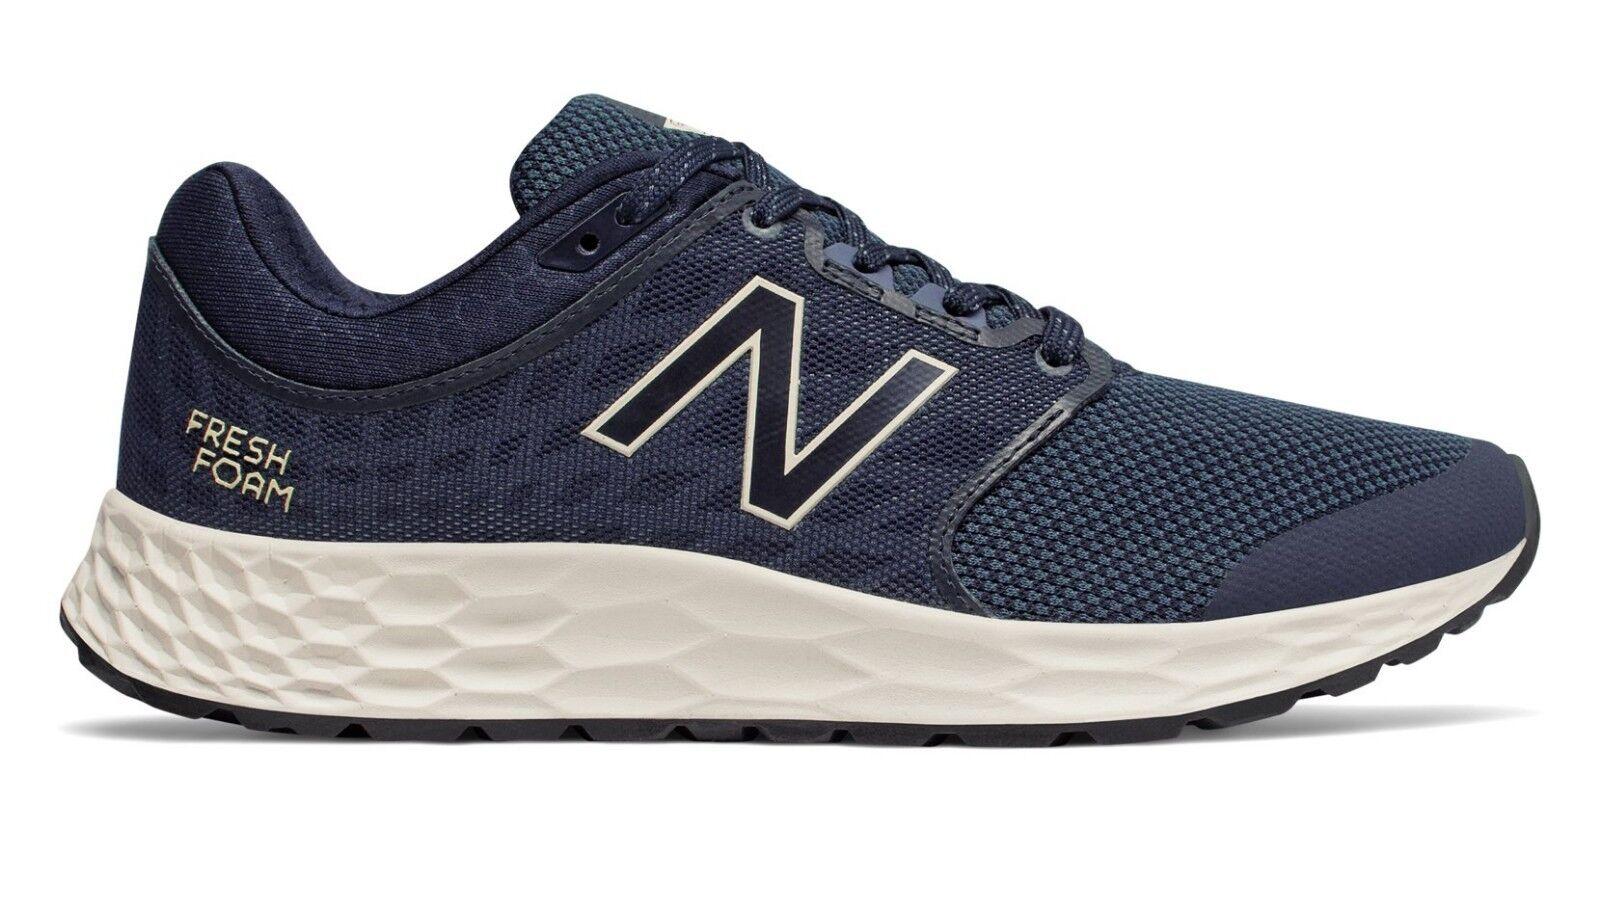 New Balance MW1165PM Men's Fresh Foam 1165 White bluee Lightweight Walking shoes